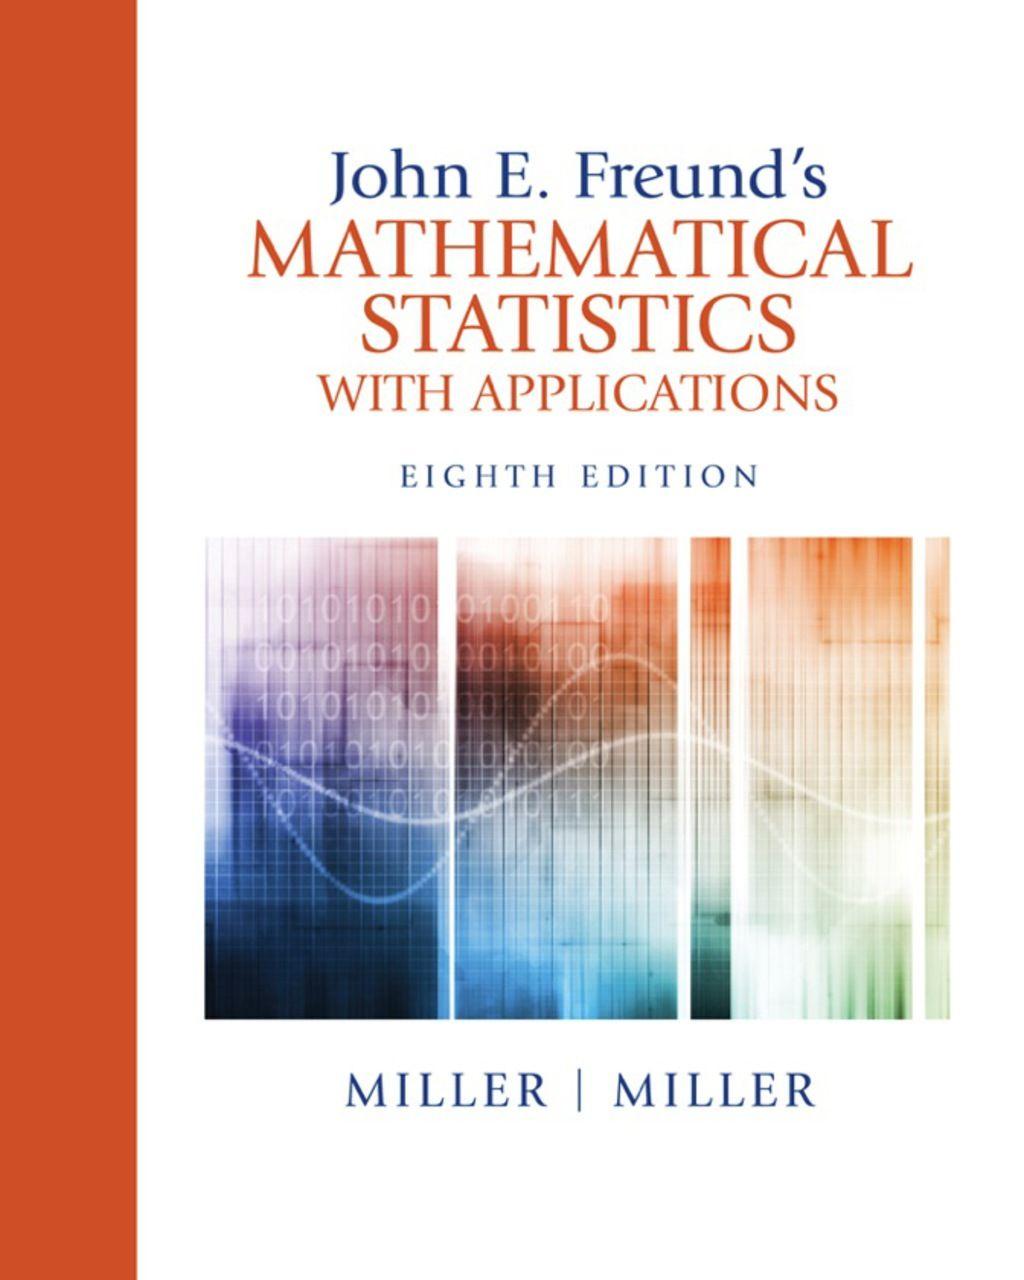 John E Freund S Mathematical Statistics With Applications Ebook Rental Textbook Pdf Books Free Books Online